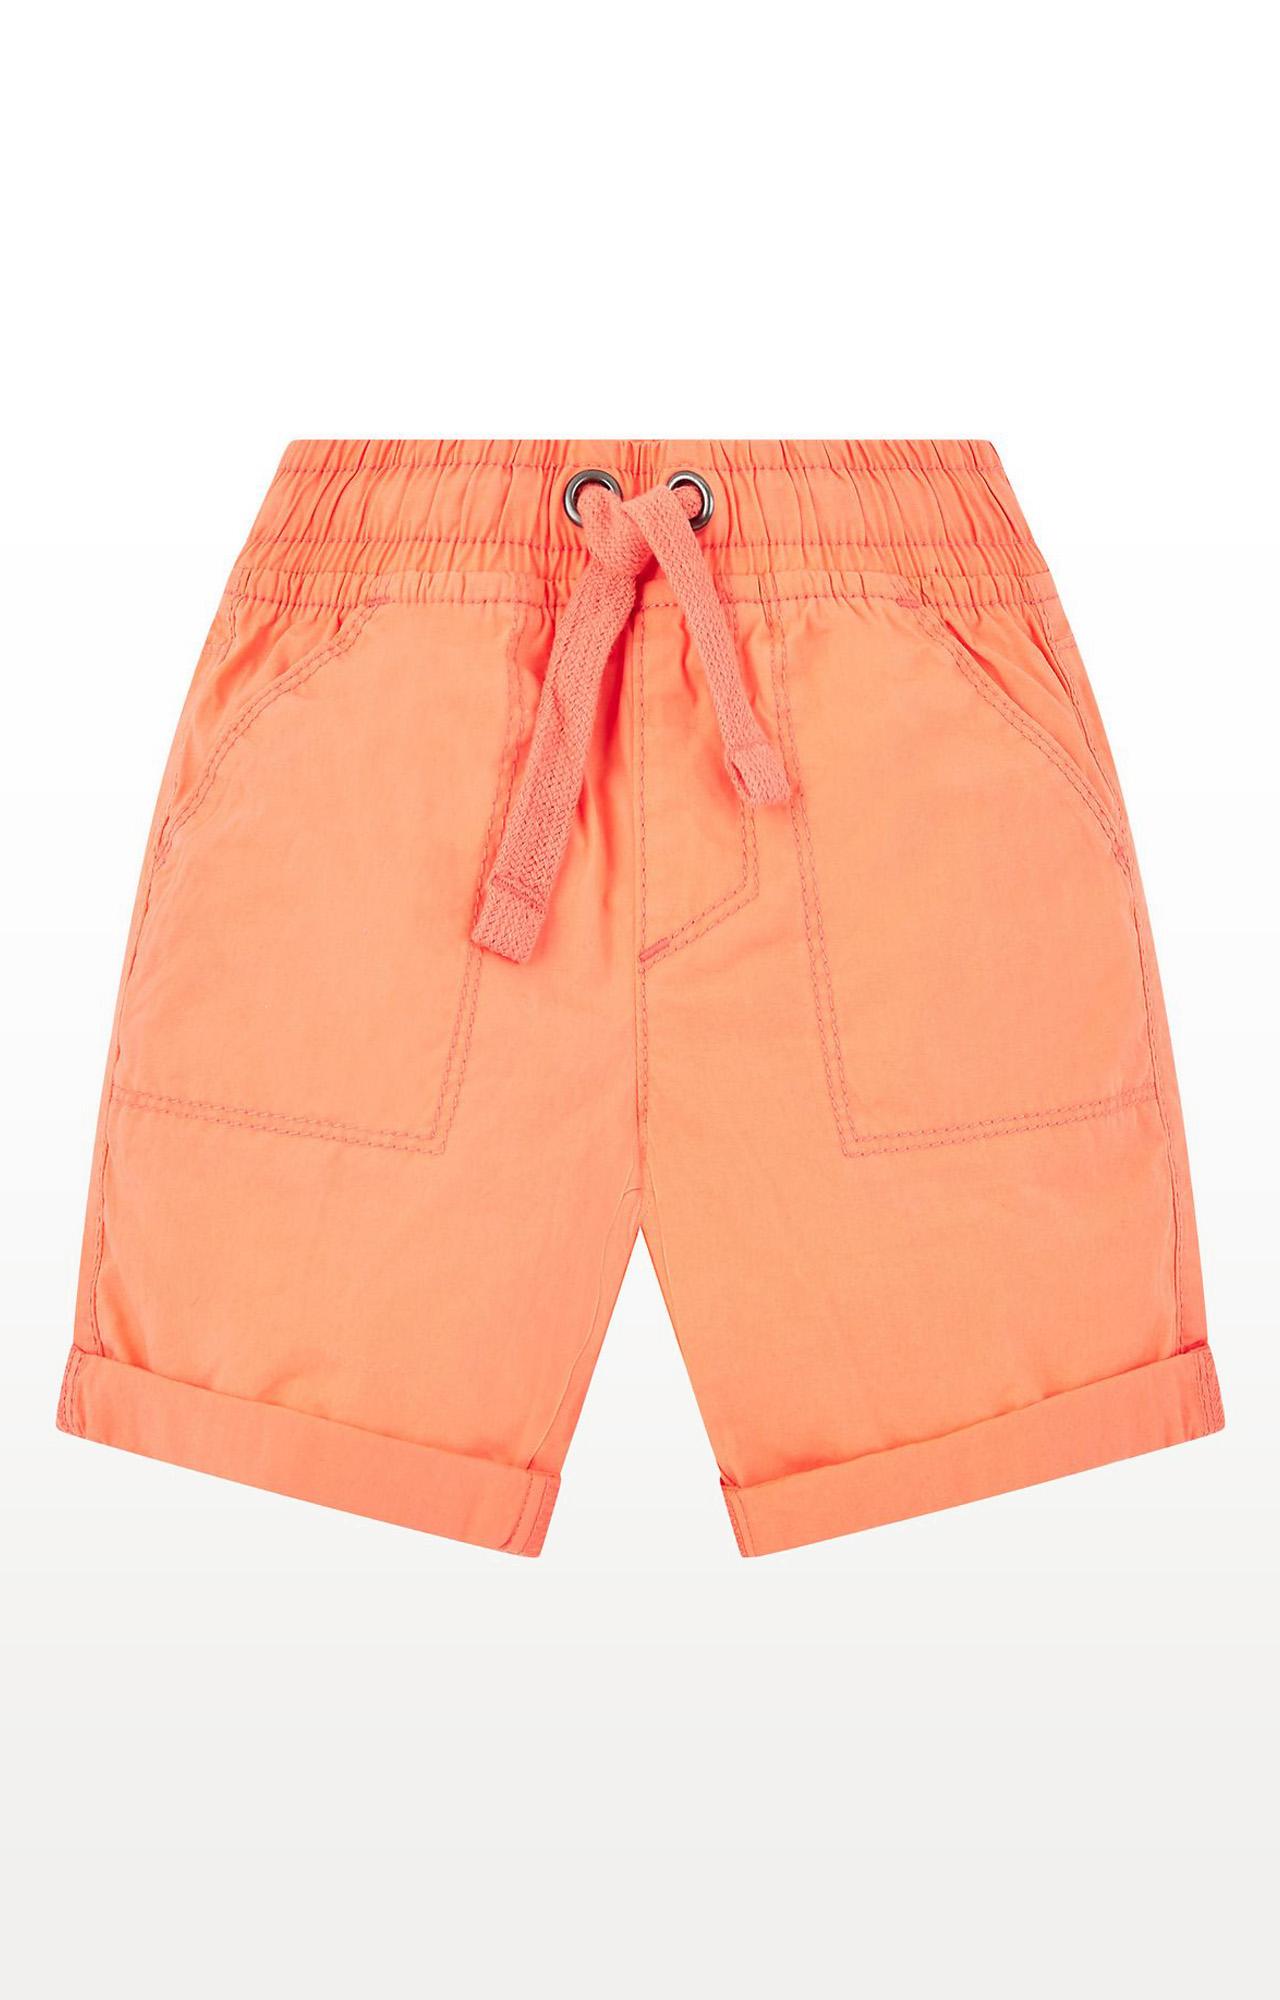 Mothercare   Boys Coral Poplin Shorts - Coral